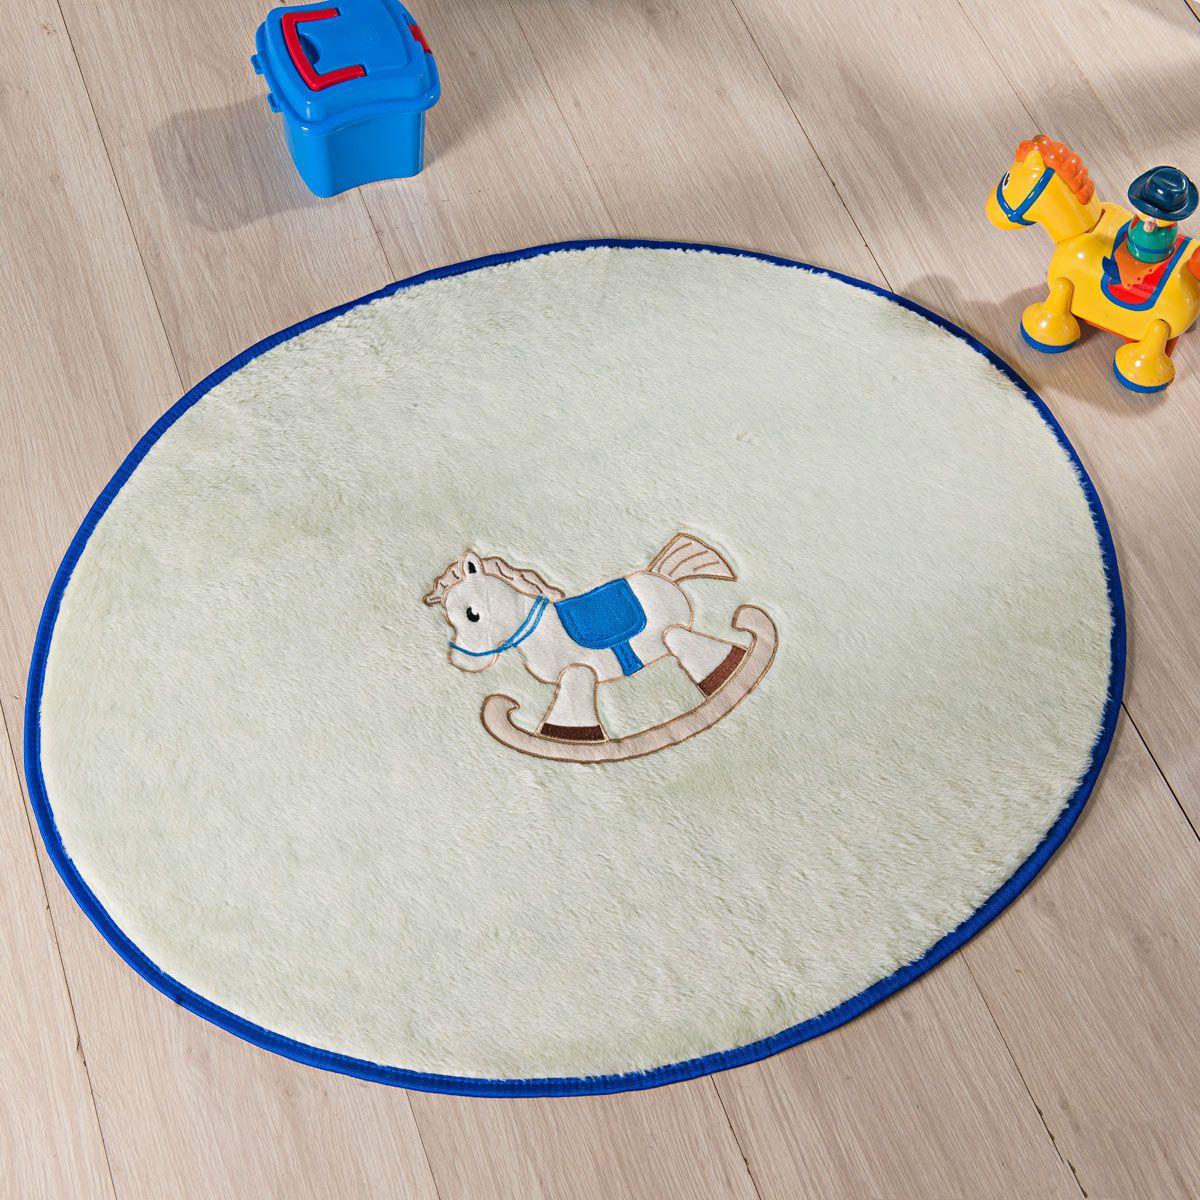 Tapete Infantil Premium Baby Formato Cavalinho Palha 78cm x 68cm